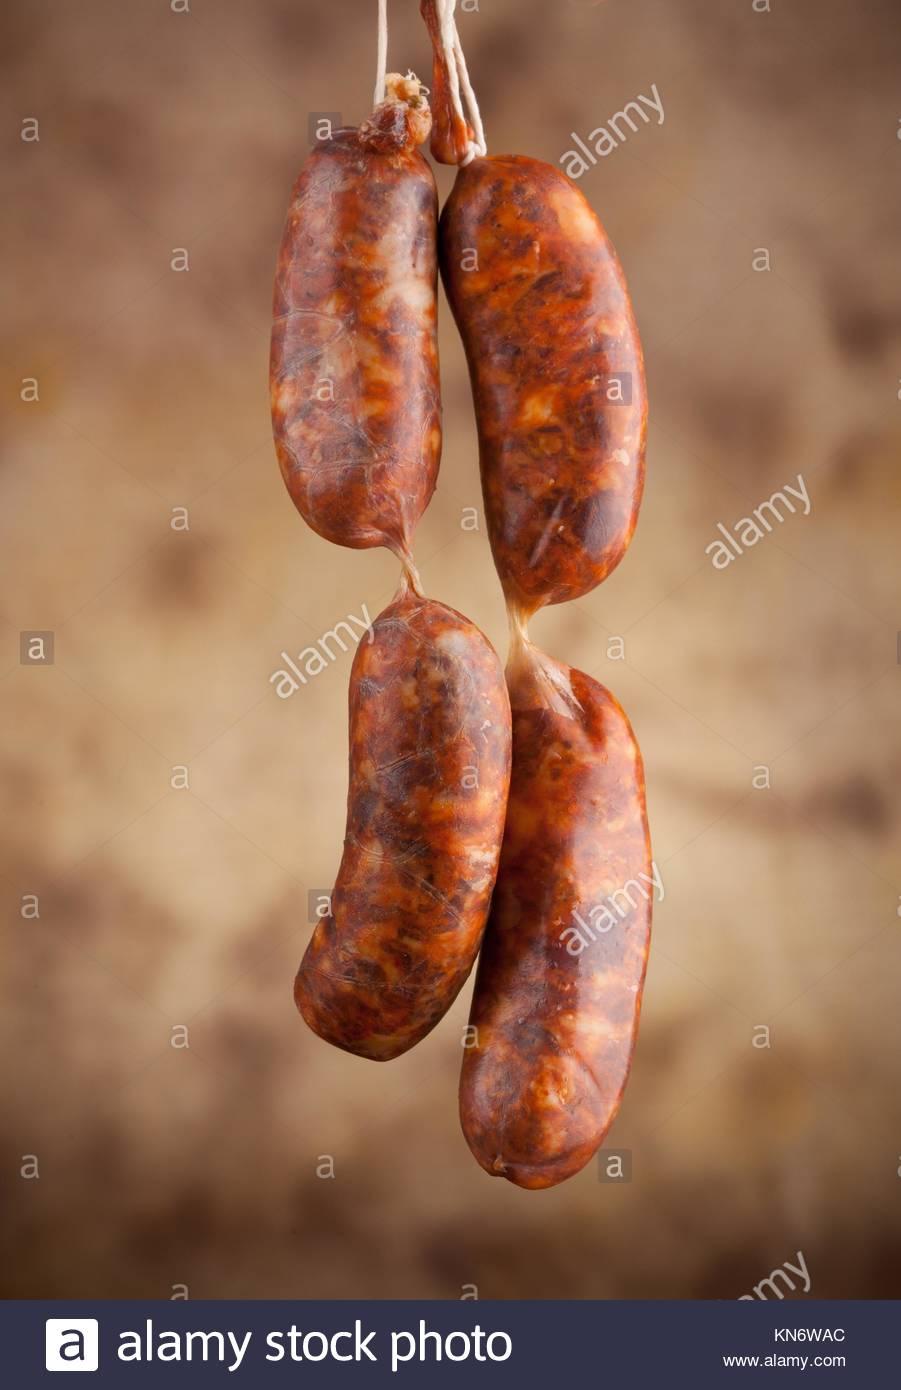 Raw sausage on beige background. - Stock Image